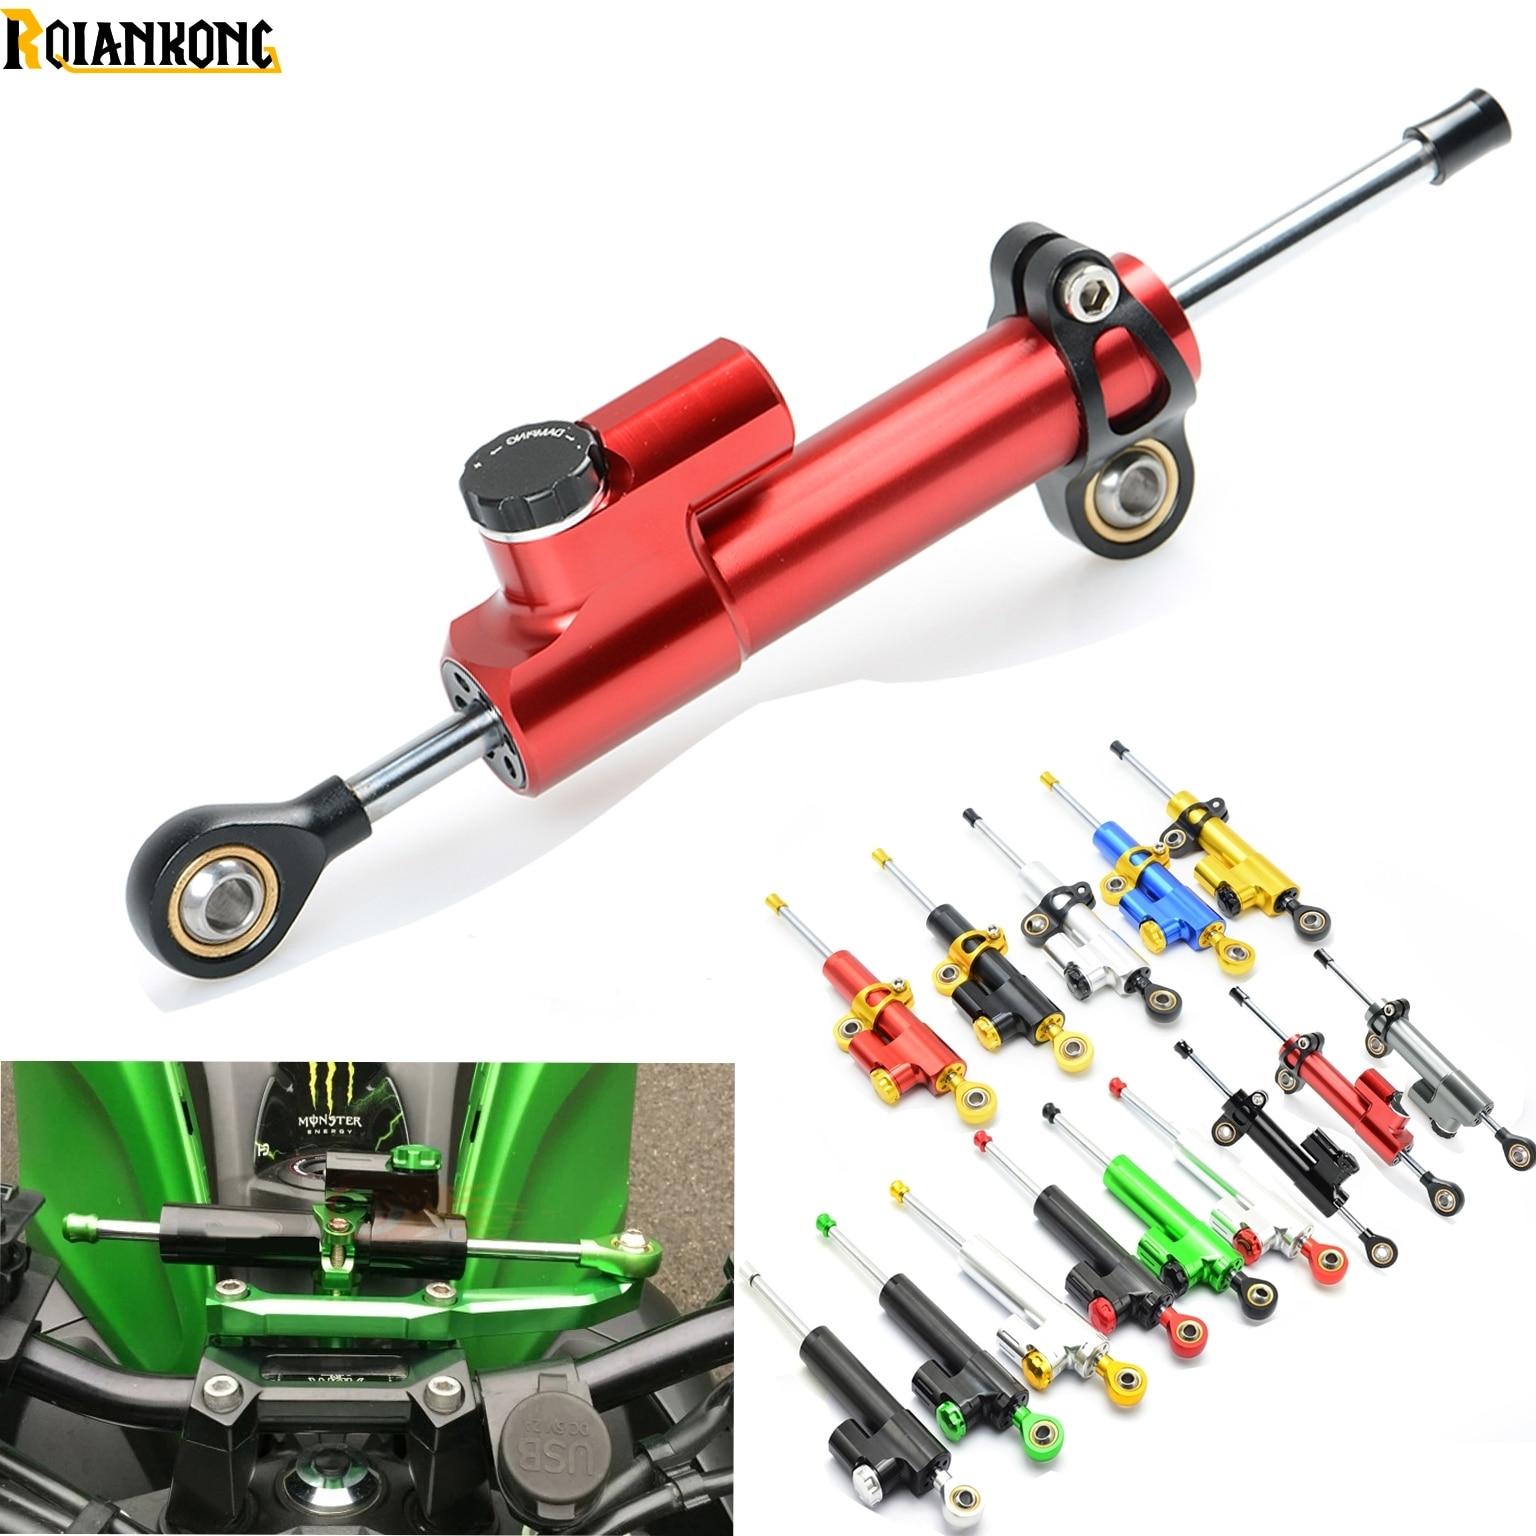 CNC Aluminum Motorcycle Steering Damper Stabilizer Linear Safe Control for Yamaha MT-01 MT-02 MT-03 MT-07 MT-09/Tracer MT-10/ABS<br>